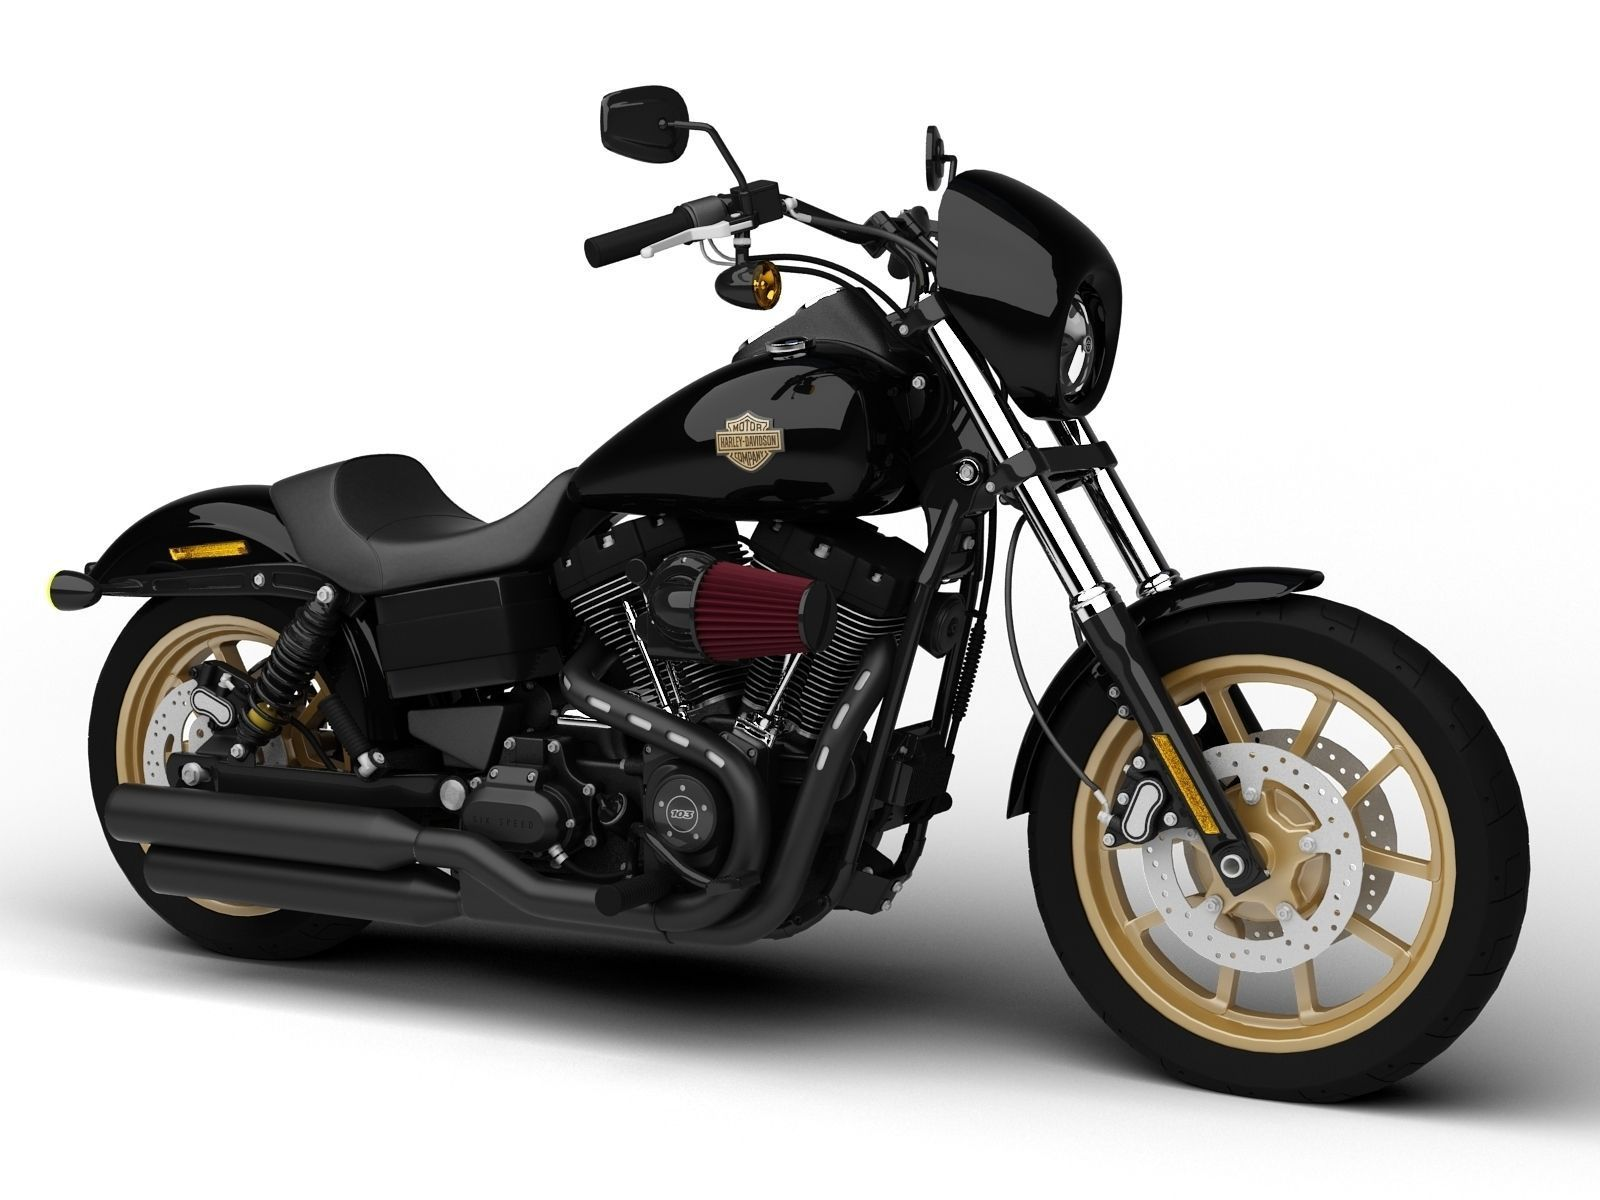 Harley Davidson Fxdl Dyna Low Rider S 2016 Model